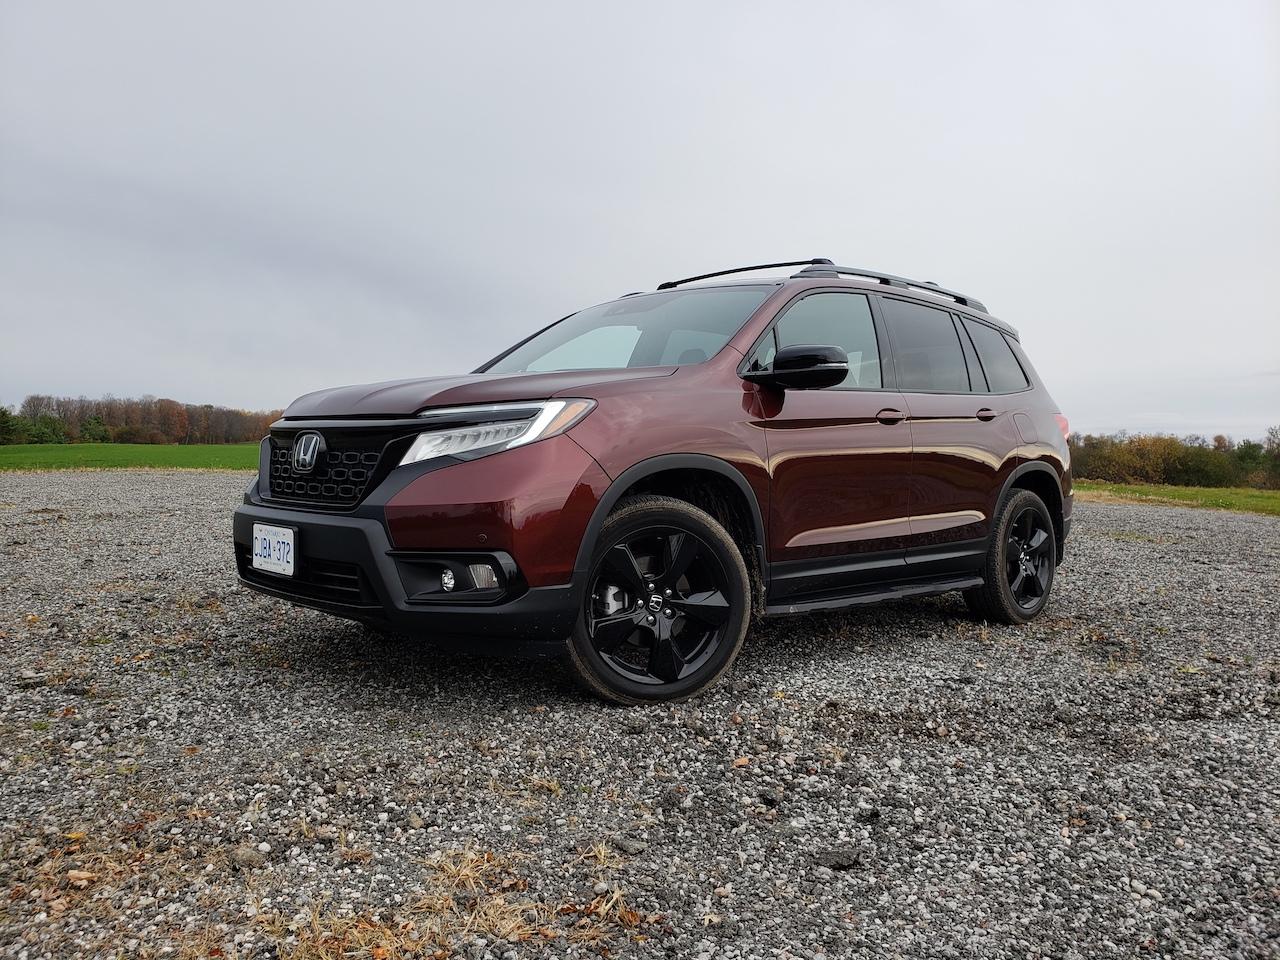 https://www.wheels.ca/car-reviews/review-2019-toyota-rav4-hybrid-xse/